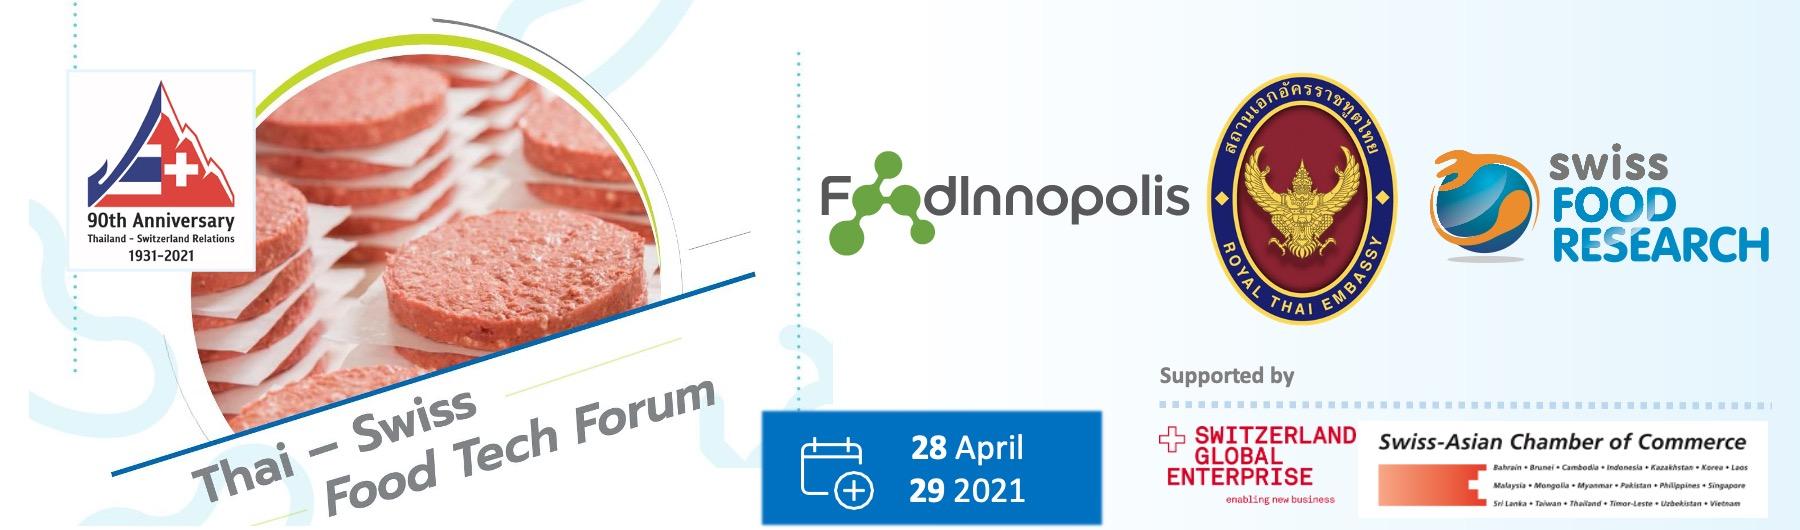 Thai-Swiss Food Tech Forum